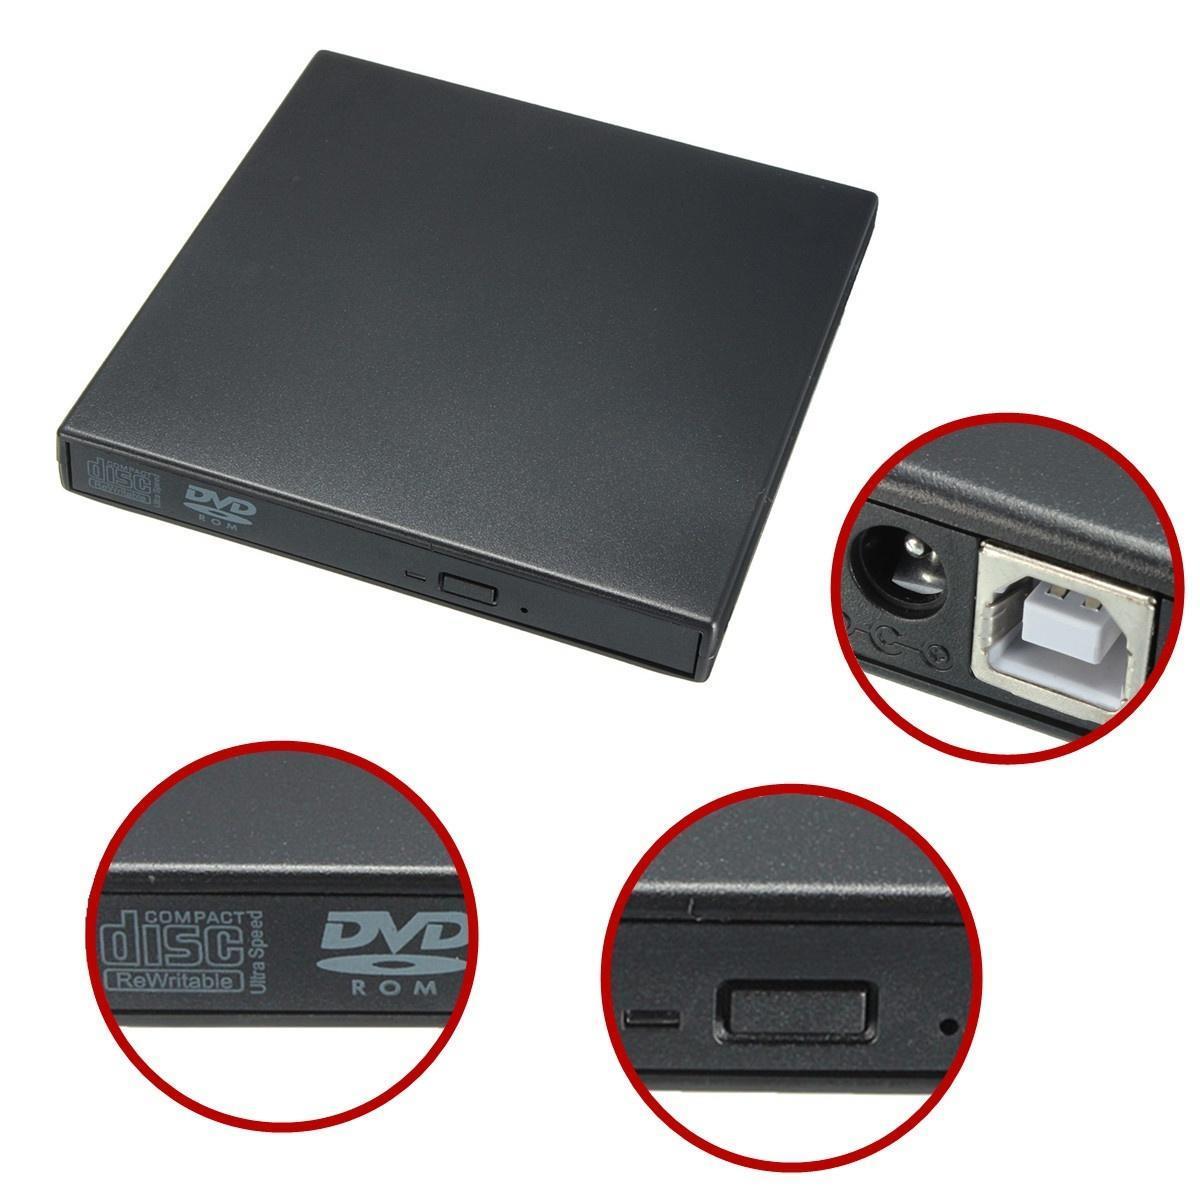 2.0 USB внешние ROM игрок читателя CD±RW Combo привод DVD Burner для портативных ПК english unlimited a2 elementary b combo 2 dvd rom